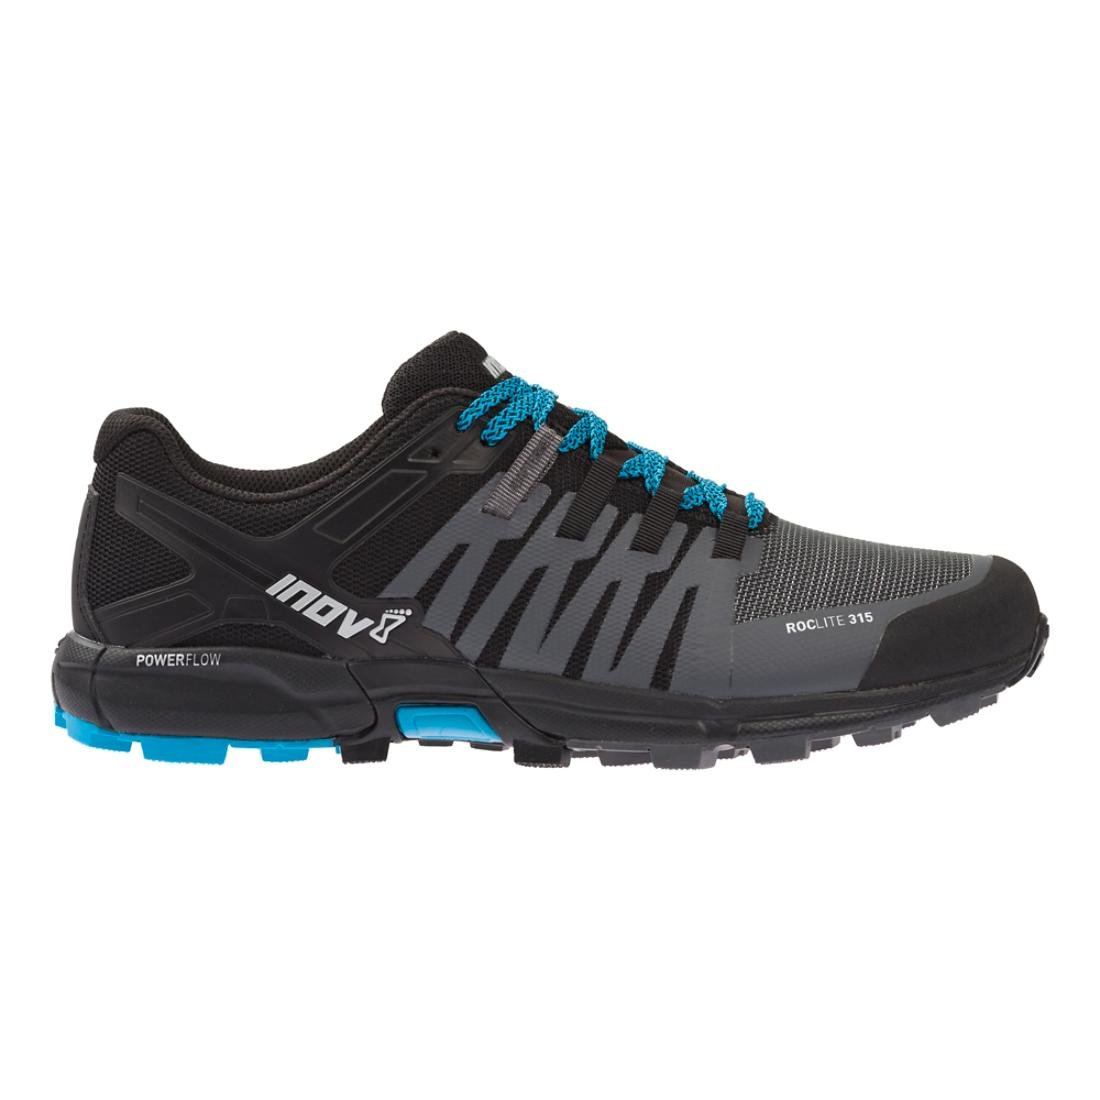 Inov8 Roclite 315 Hombre Ajuste Estándar Zapatillas De Correr Gris/Negro / Azul - gris / Negro/Azul, 8.5 UK 8.5 UK gris / Negro/Azul